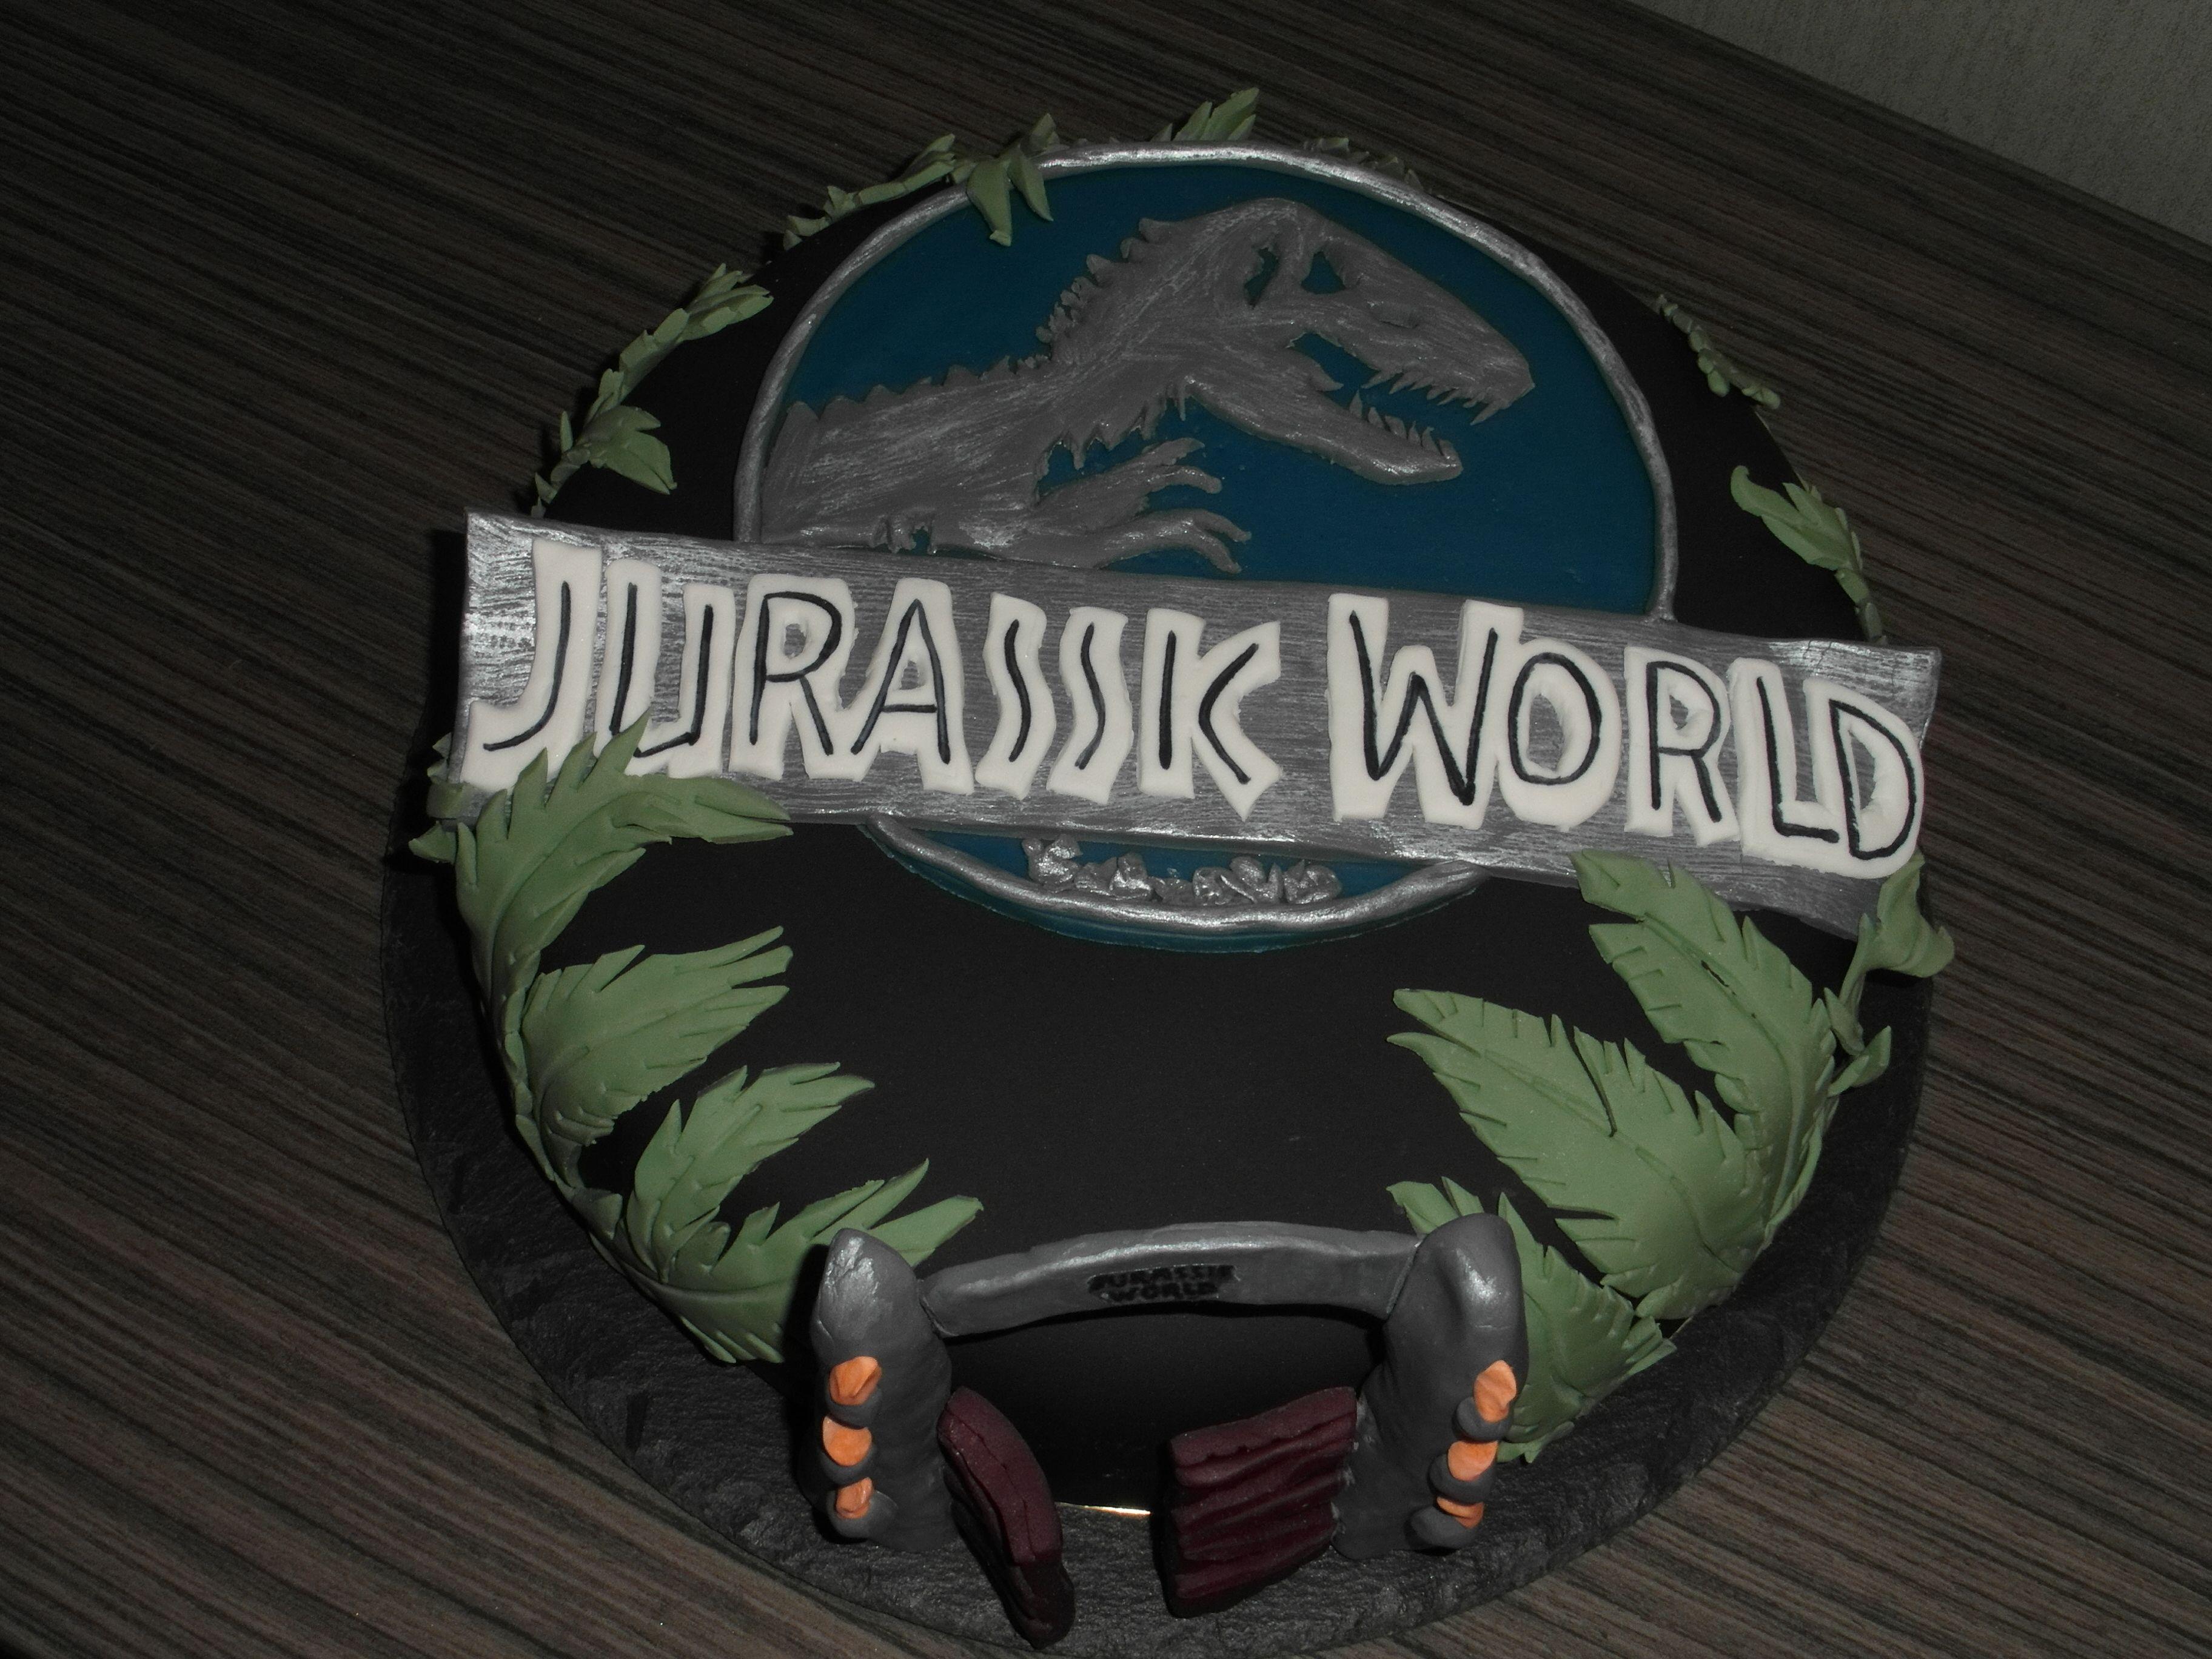 Lego Jurassic World Cake Images : Jurassic world cake Jurassic Park Pinterest Cake ...